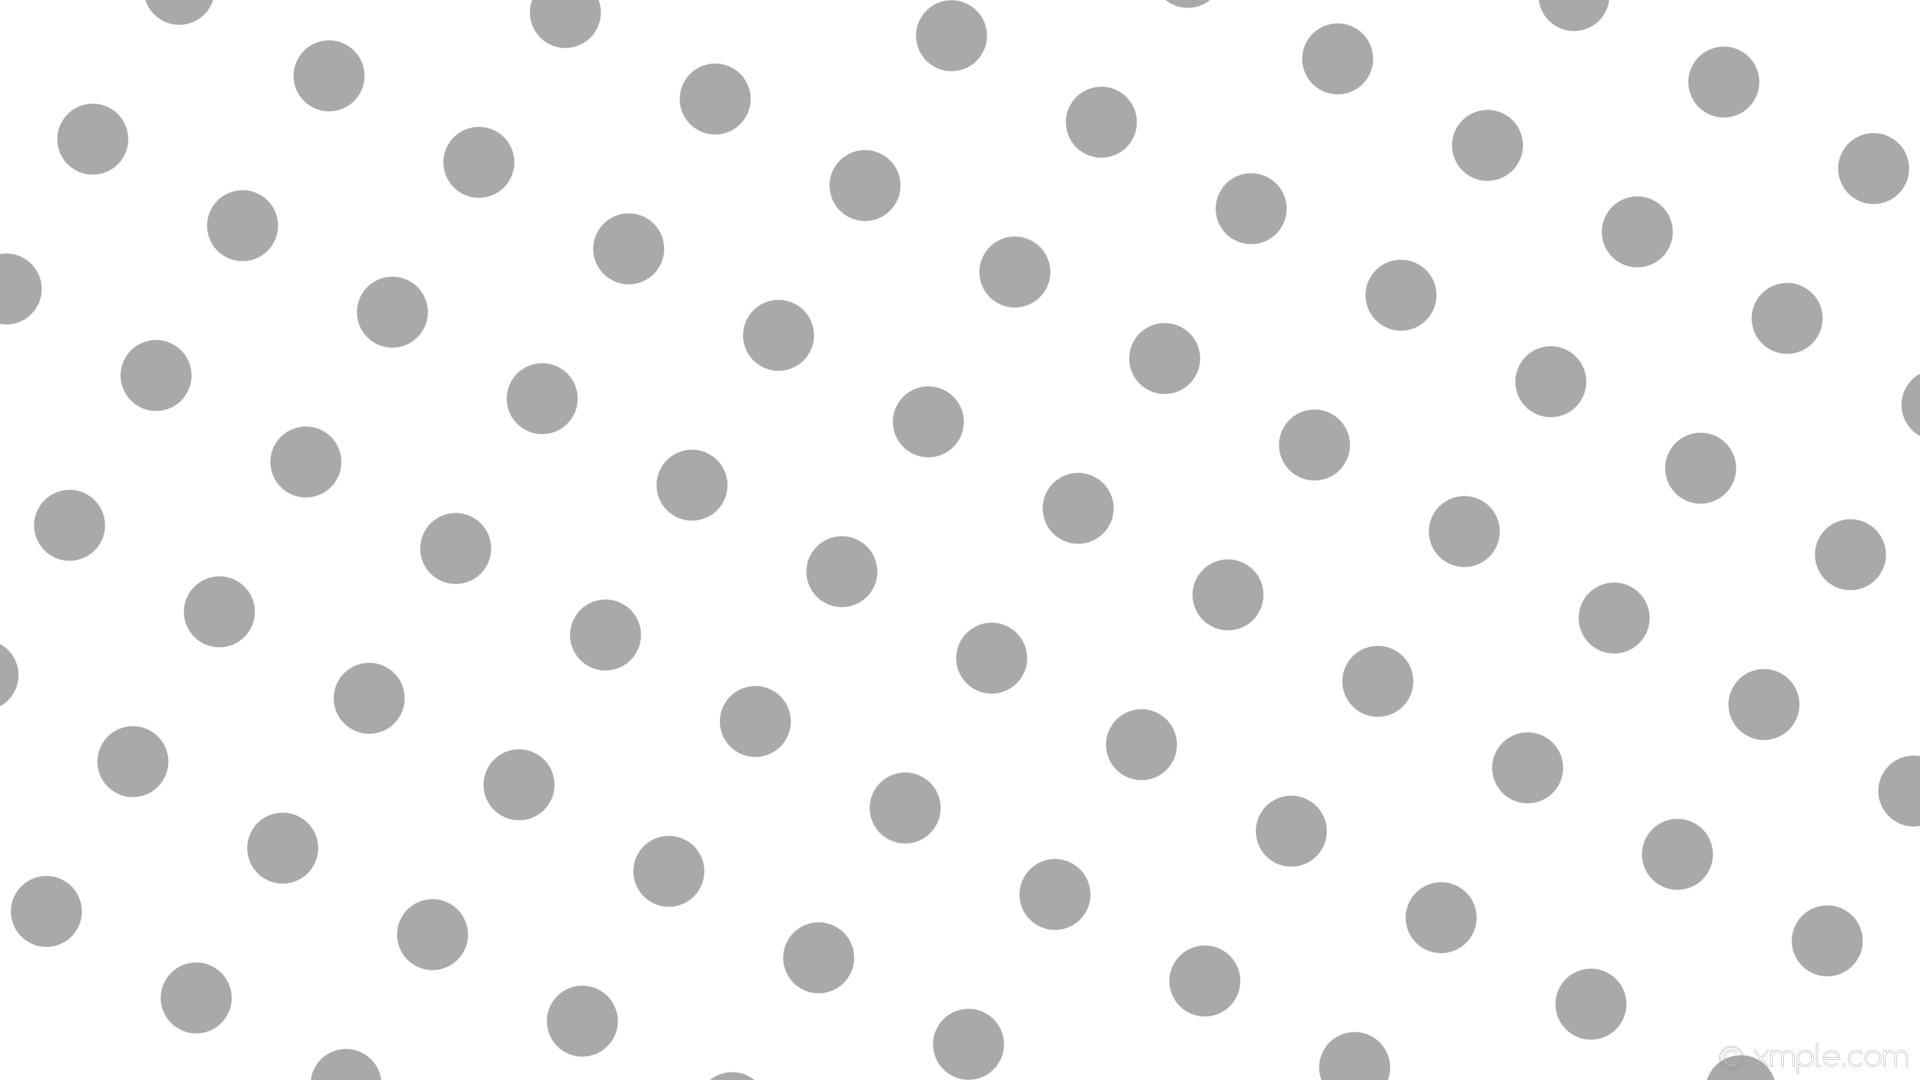 wallpaper white polka dots spots grey dark gray #ffffff #a9a9a9 240° 71px  173px